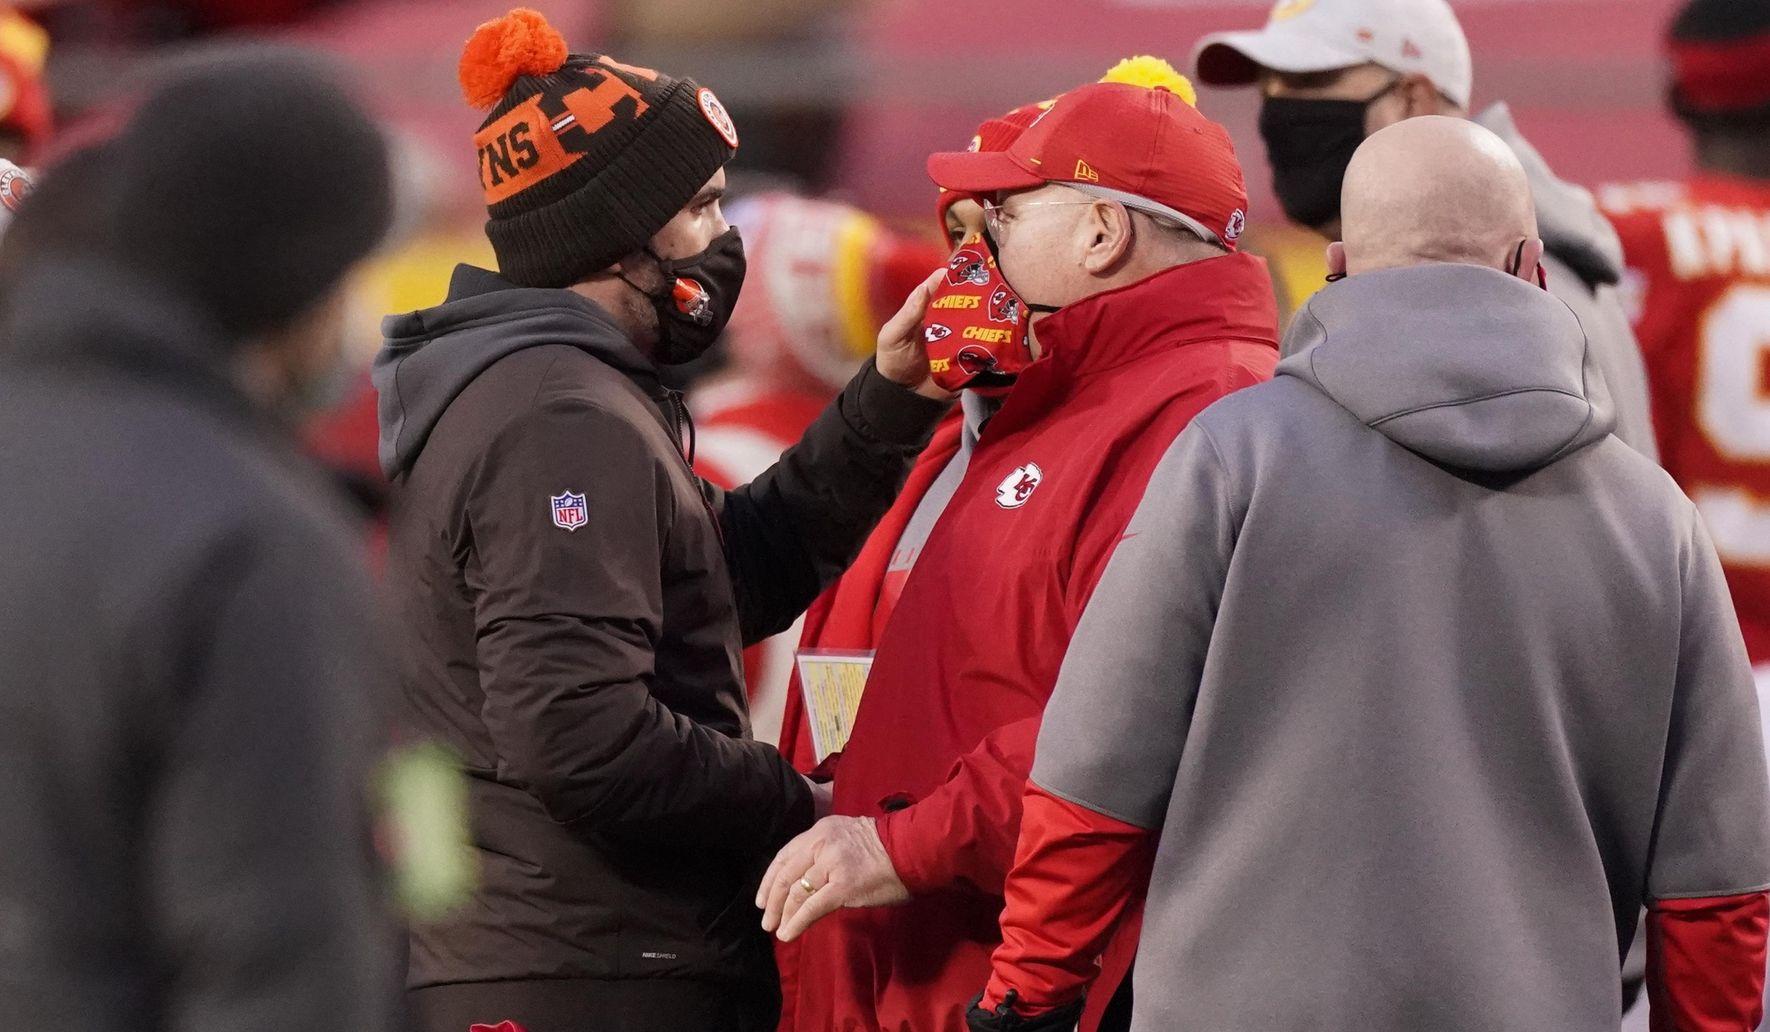 Browns_chiefs_football_33457_c0-135-3228-2017_s1770x1032